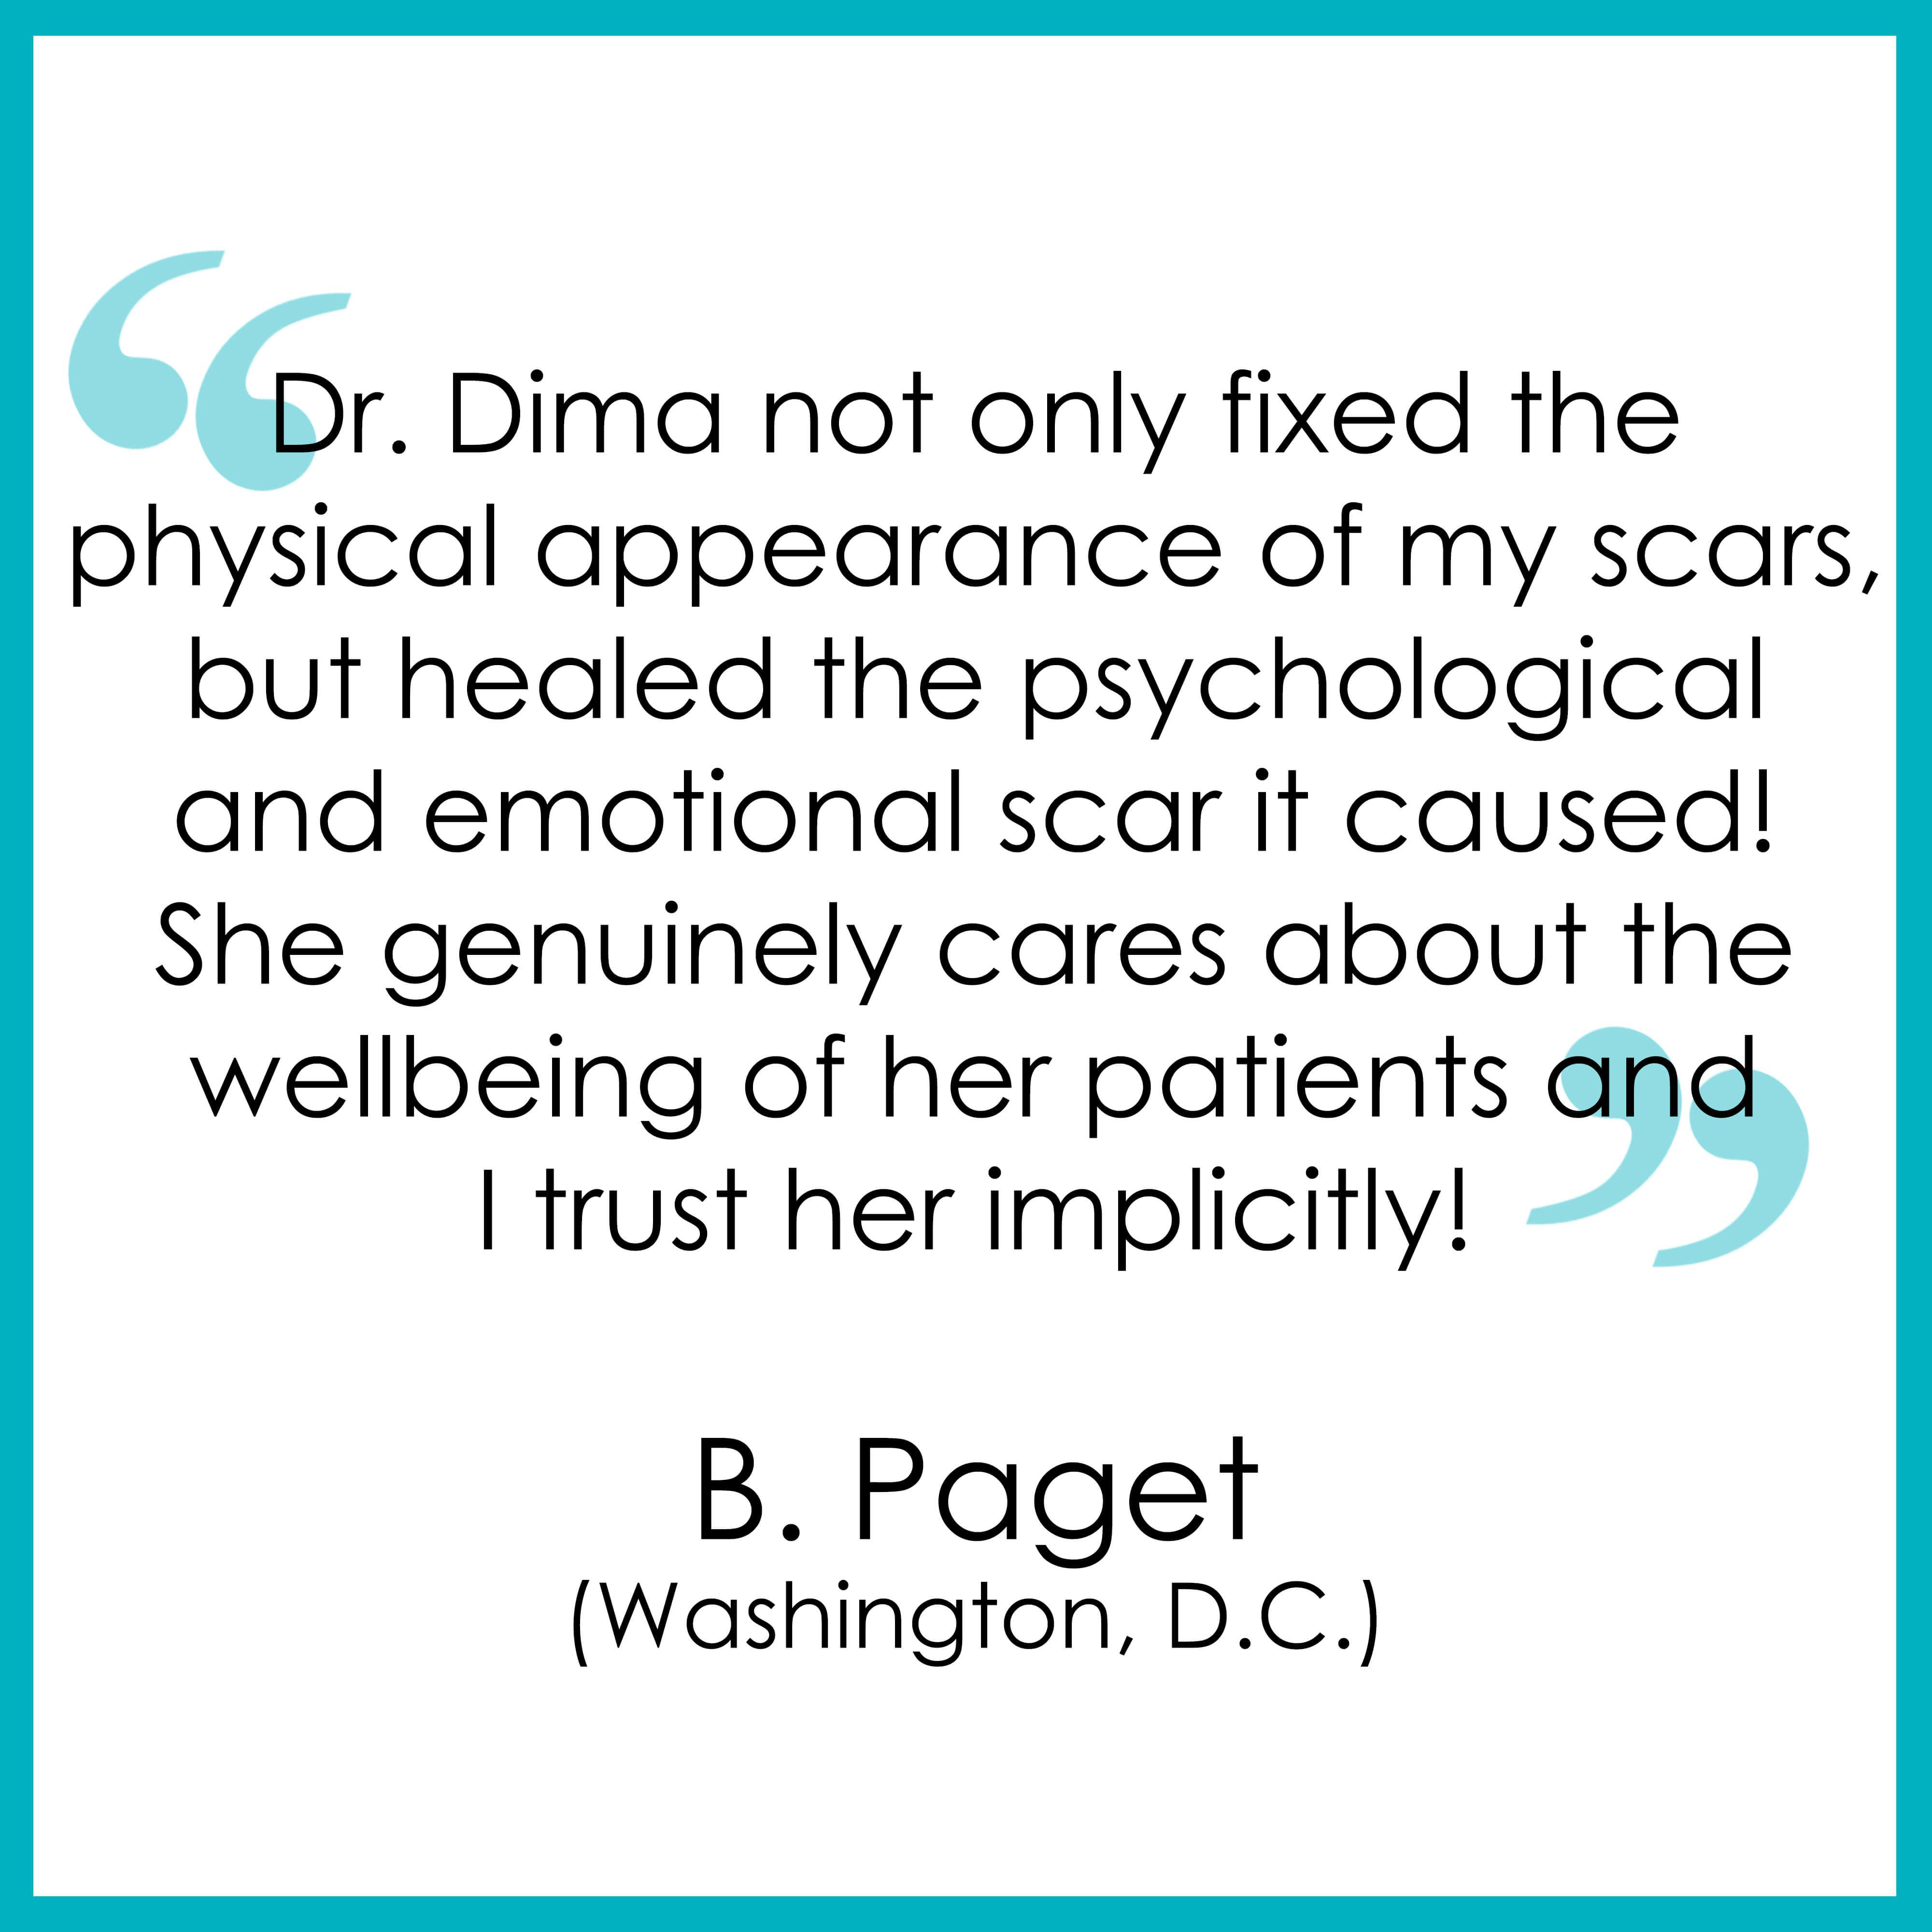 B. Paget